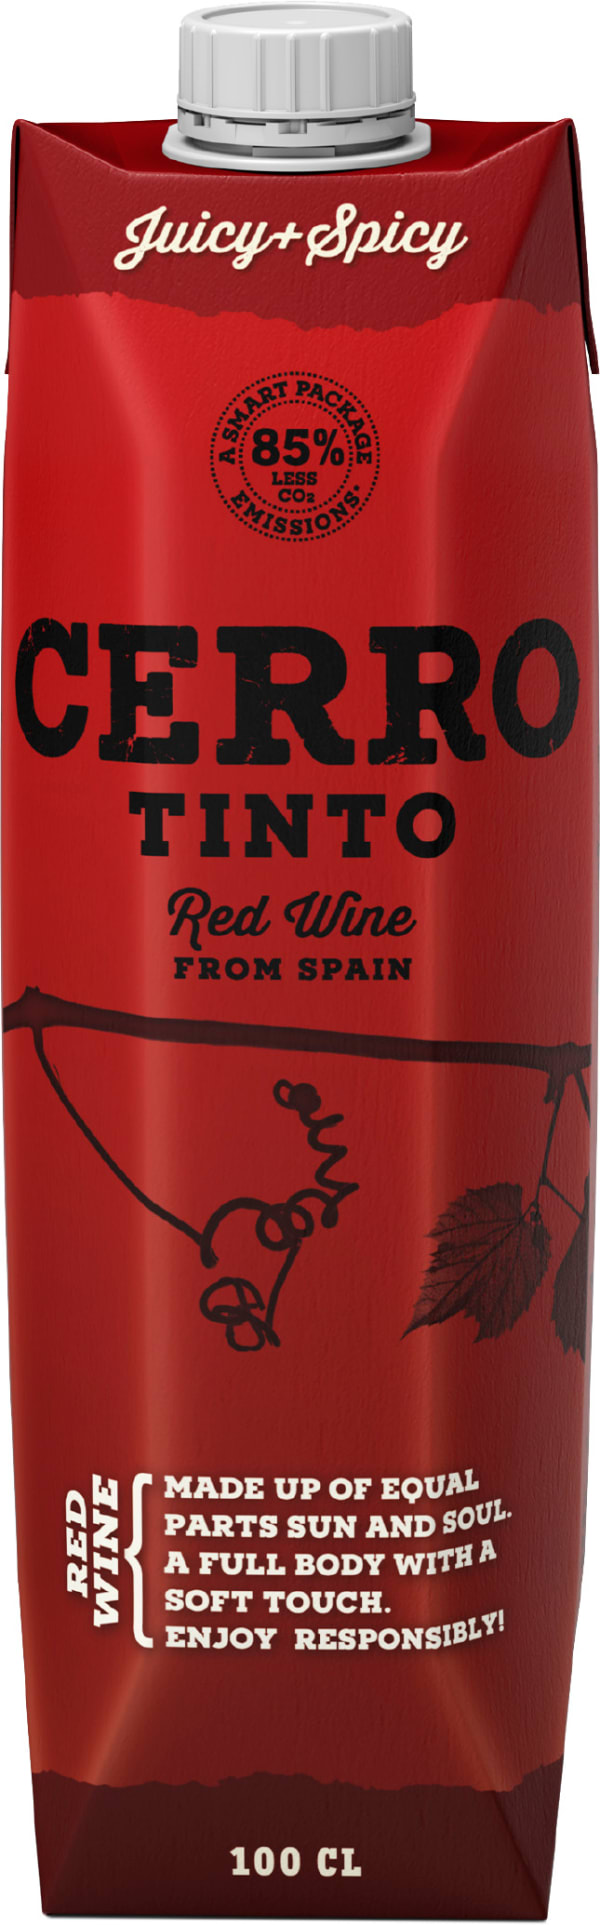 Cerro Tinto carton package